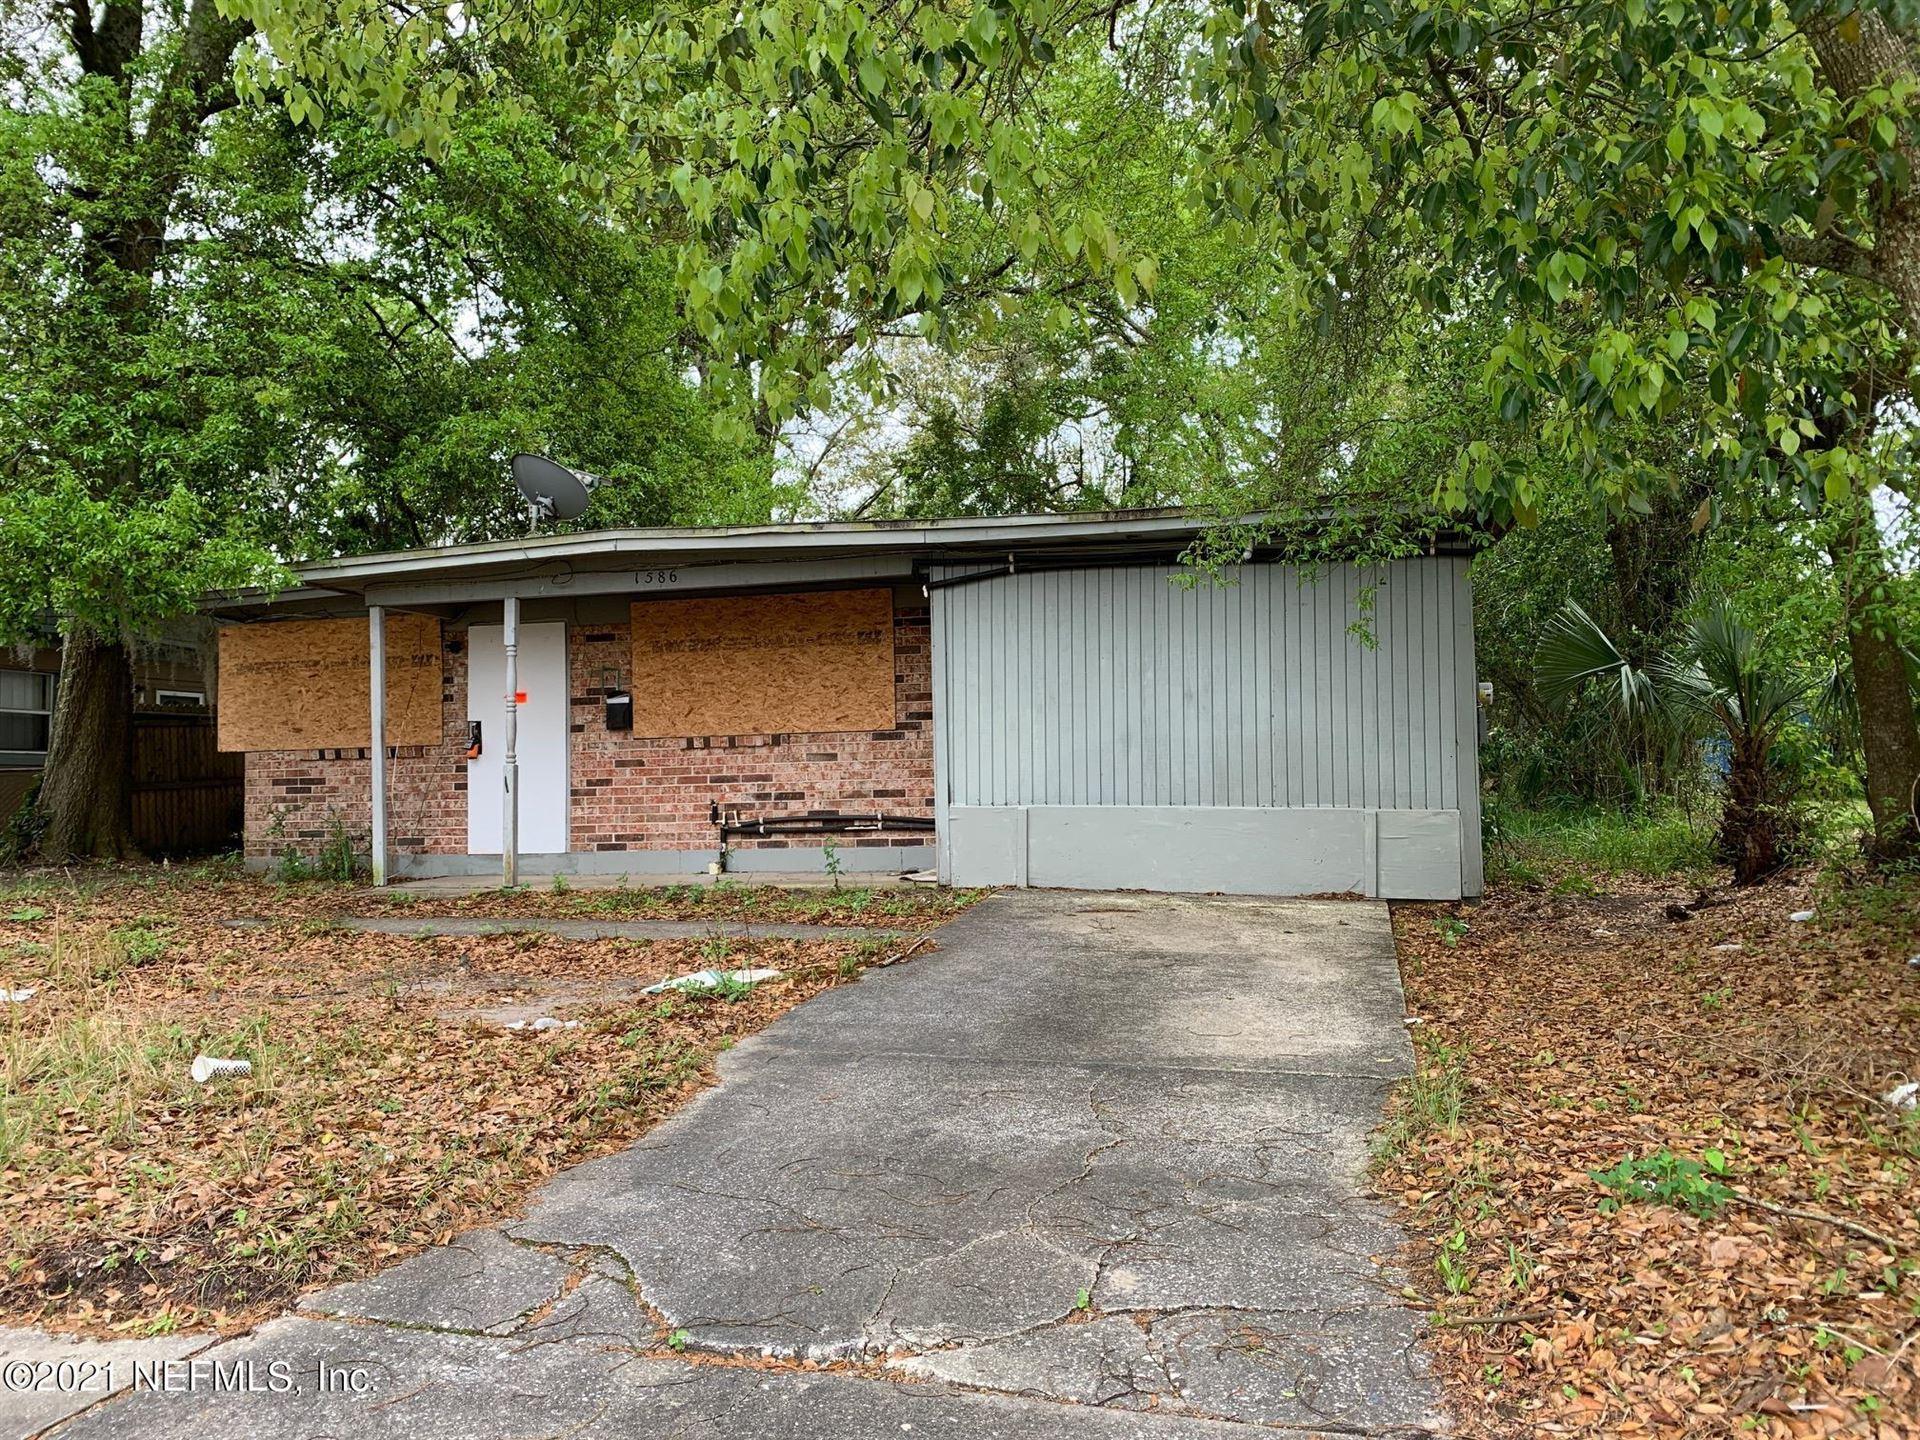 1586 W 36TH ST, Jacksonville, FL 32209 - MLS#: 1100945